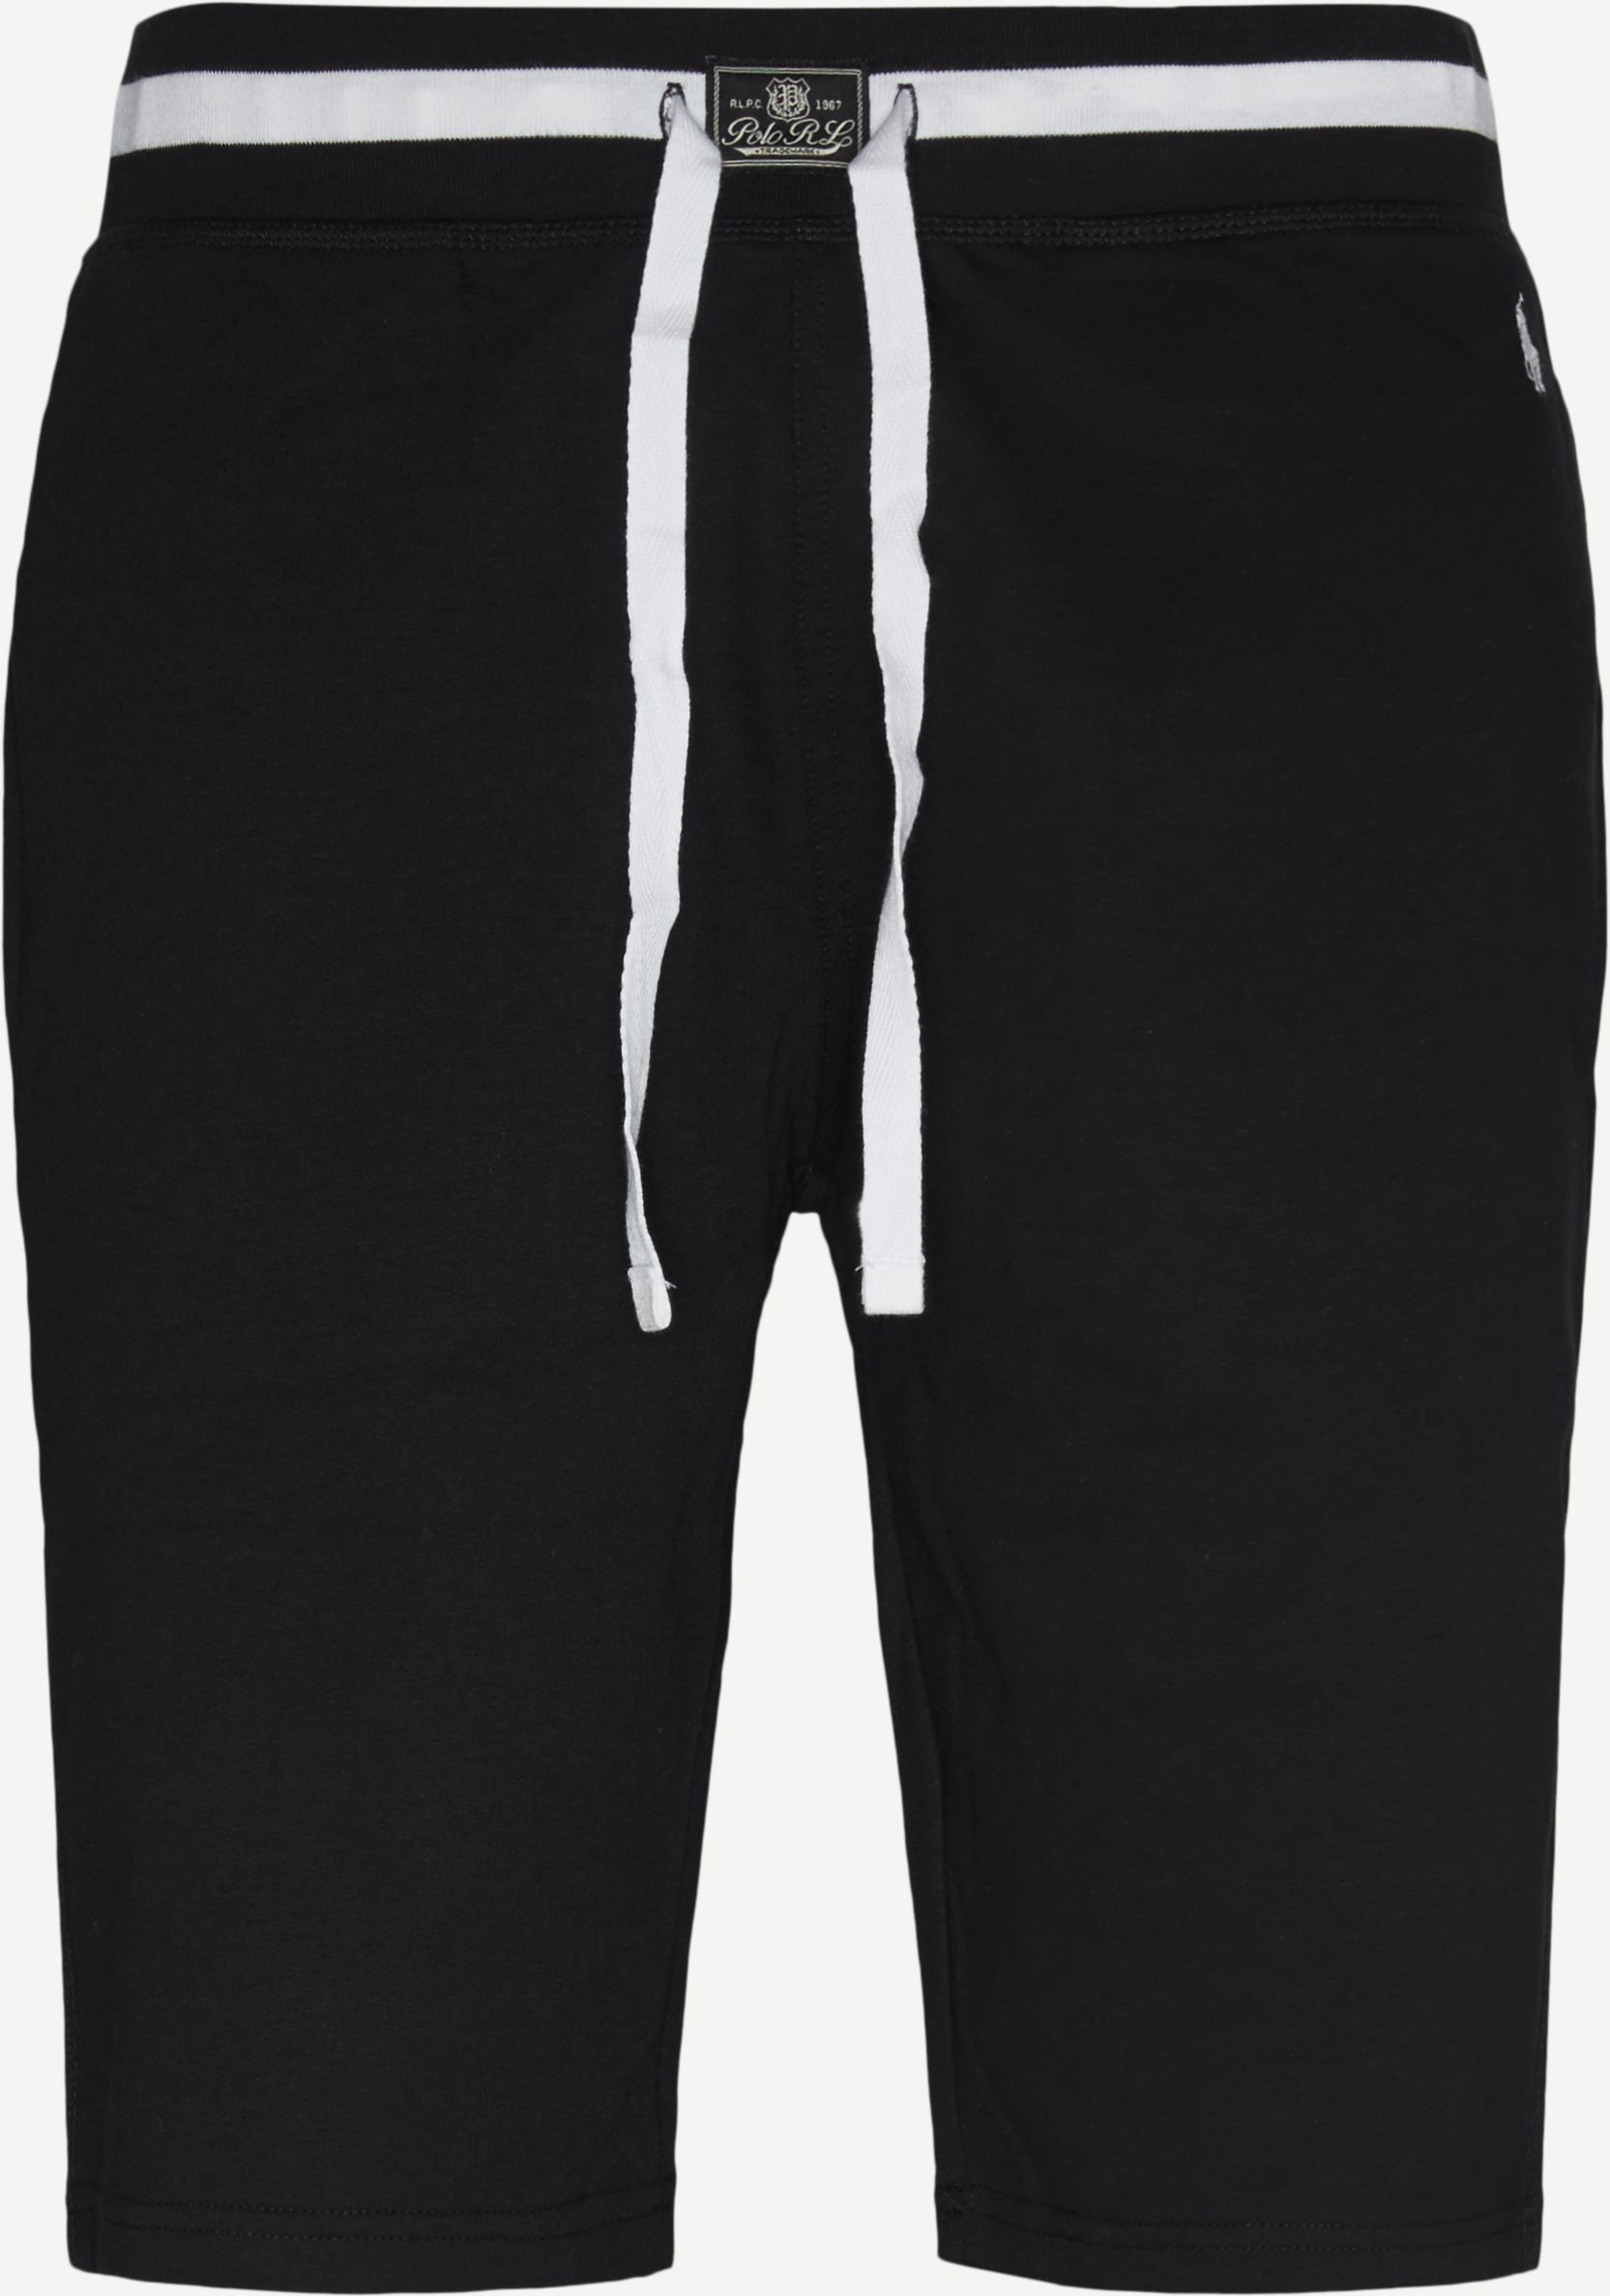 Cotton Fleece Shorts - Shorts - Regular fit - Sort